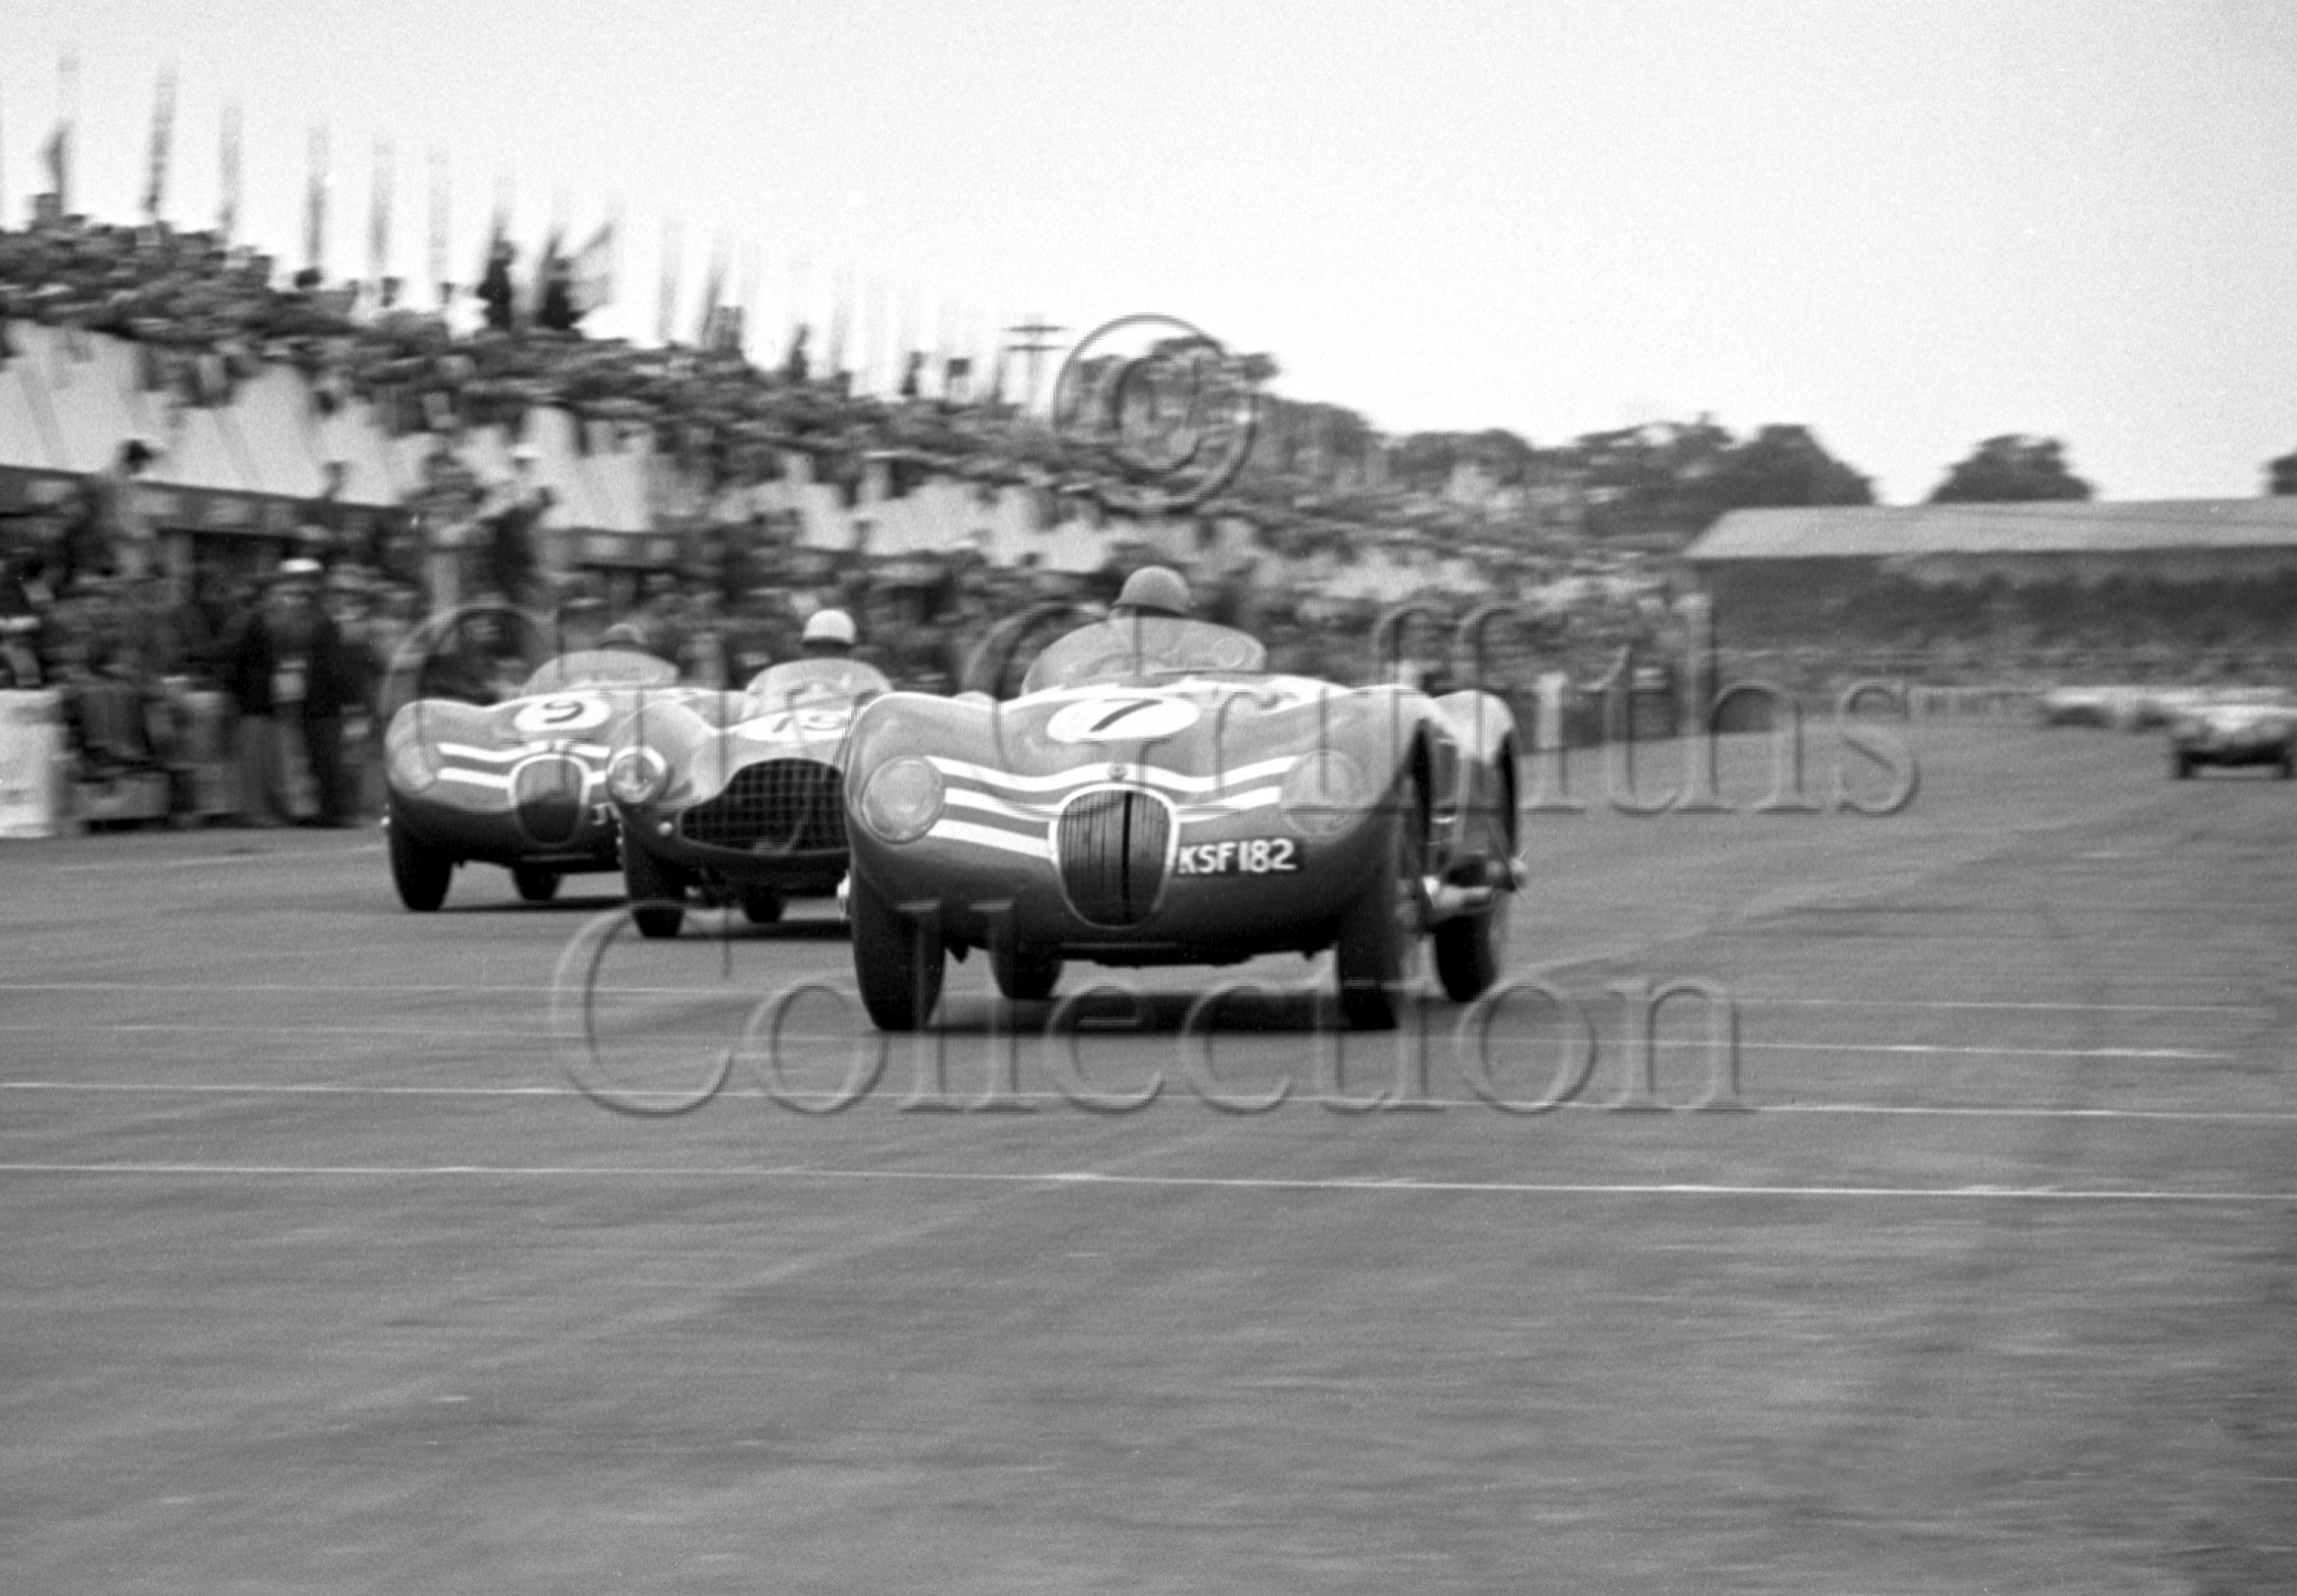 74-53–N-Sanderson–Jaguar-C-Type-KSF-182–Silverstone–18-07-1953.jpg - Guy Griffiths Collection